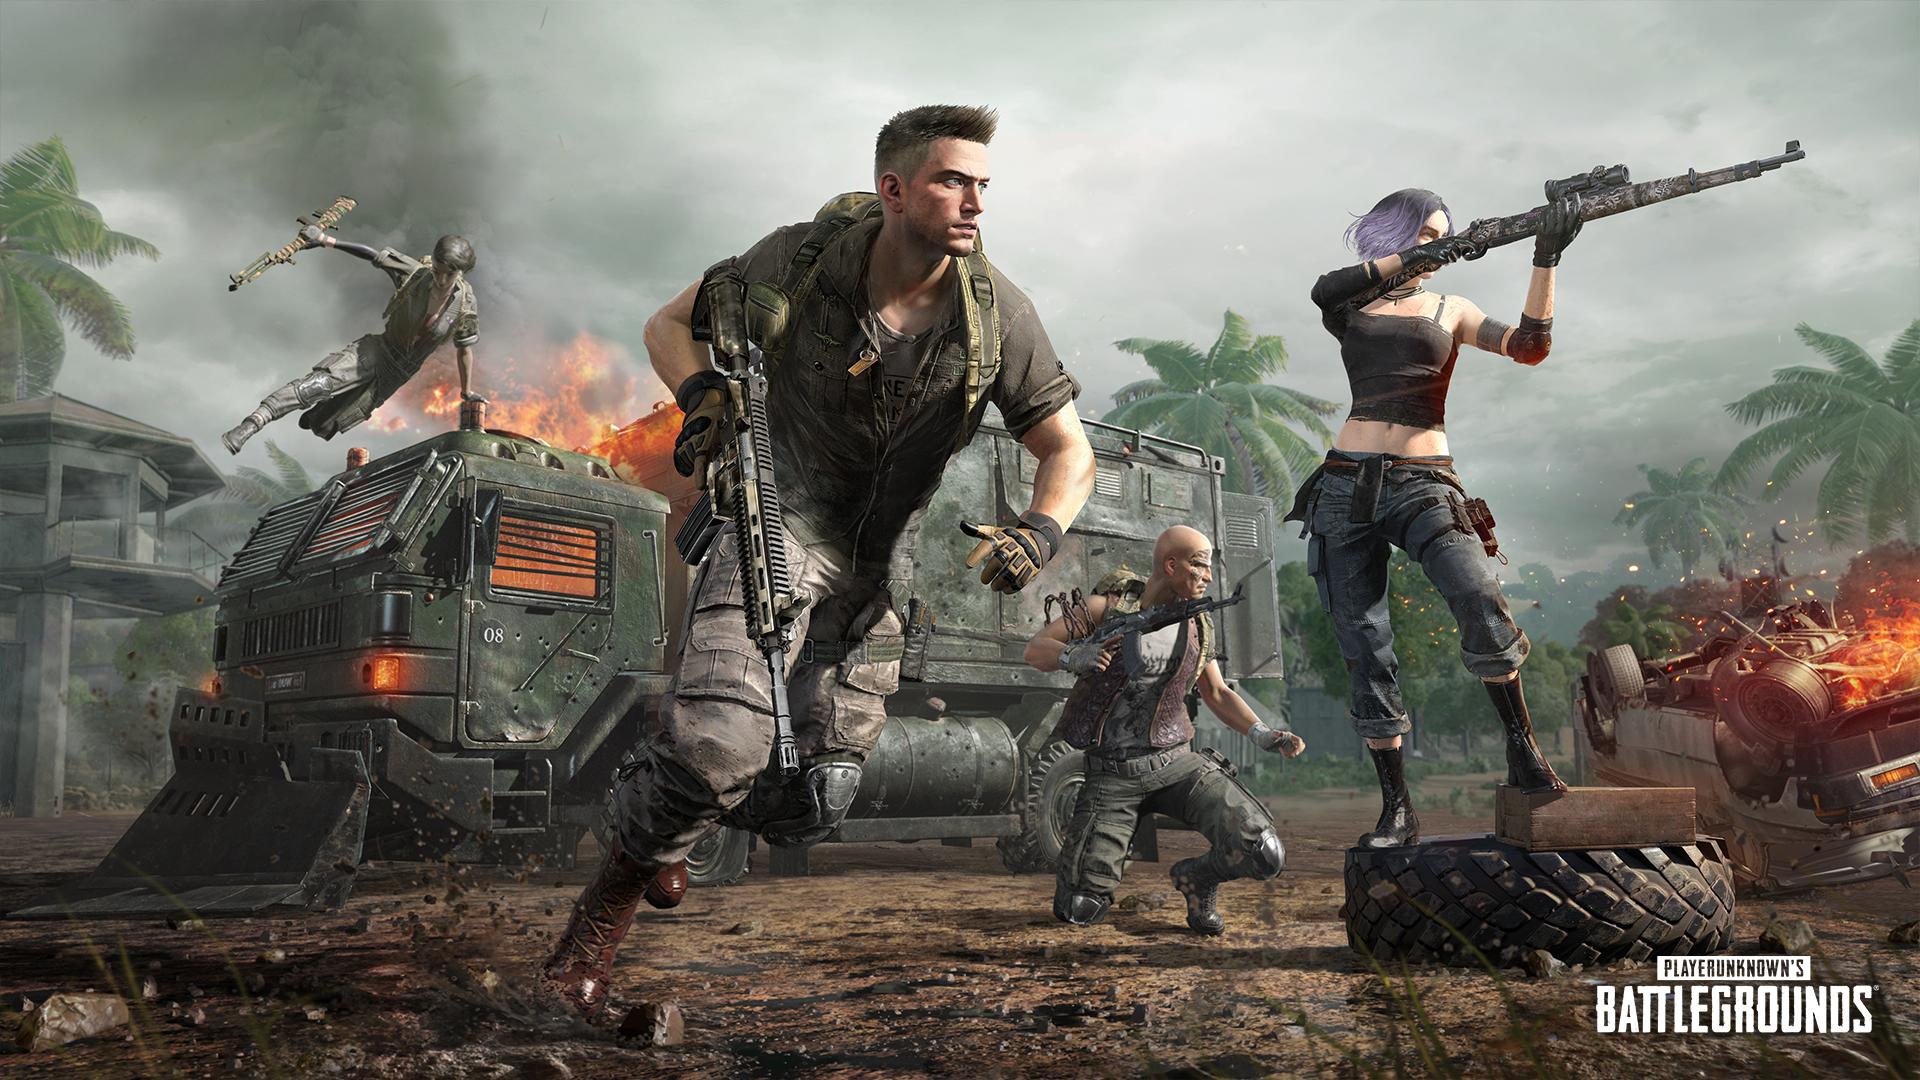 PUBG - PlayerUnknown's Battlegrounds Poster